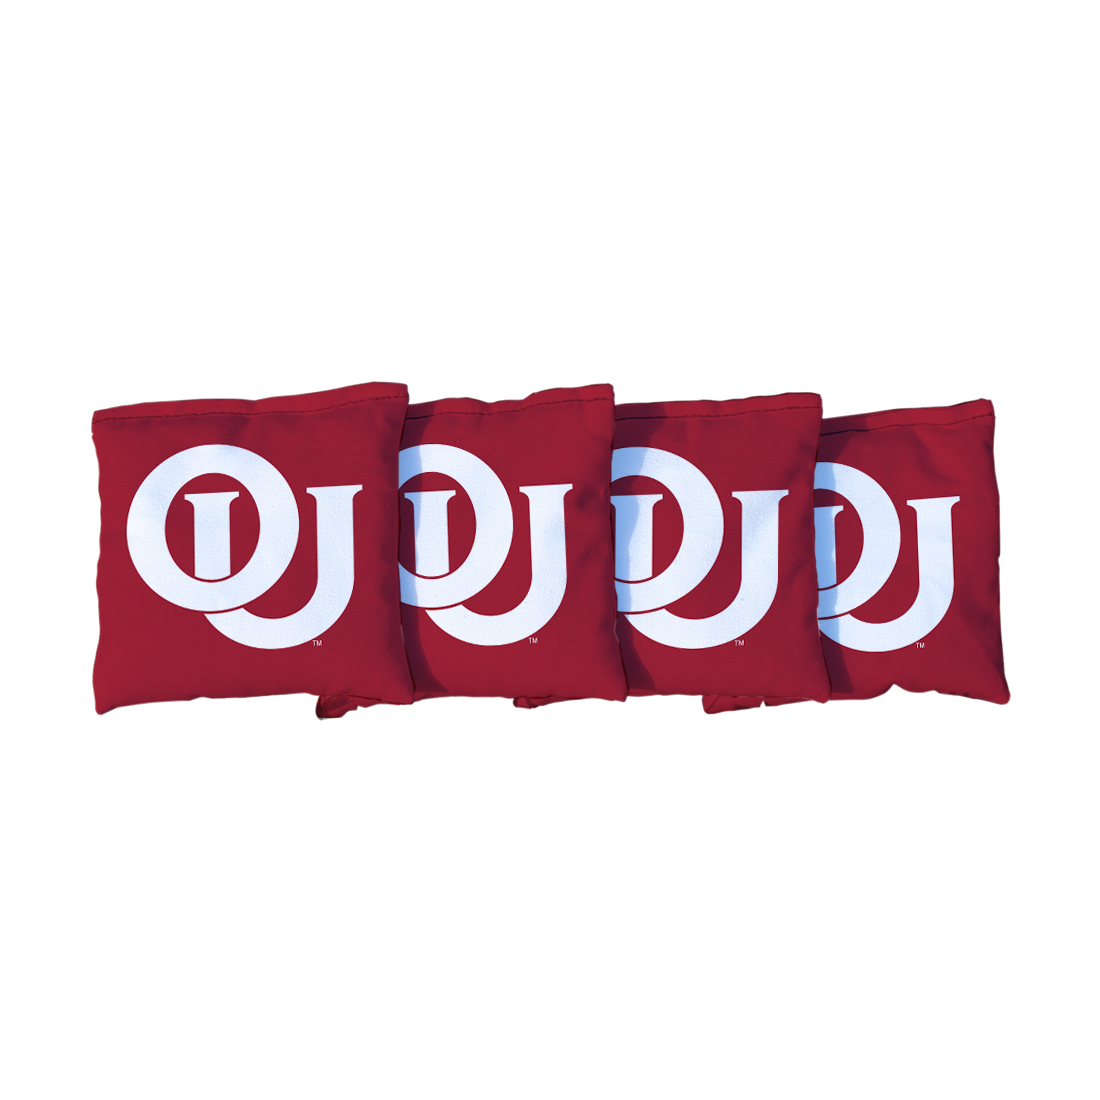 4 College Vault Oklahoma Sooners Red Cornhole Bags